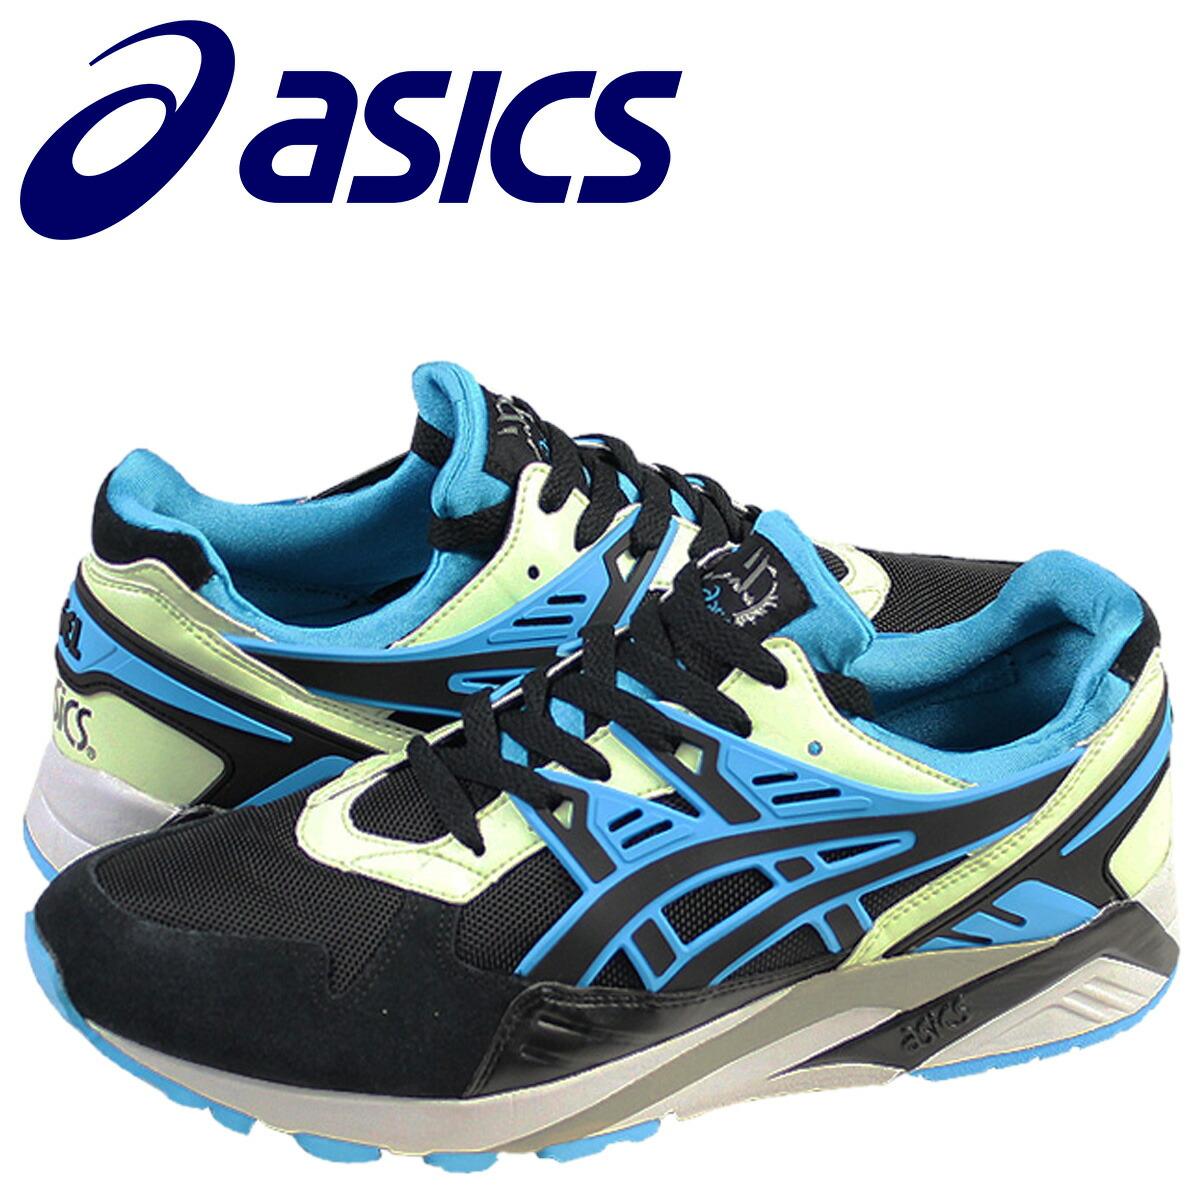 shoe brand asics